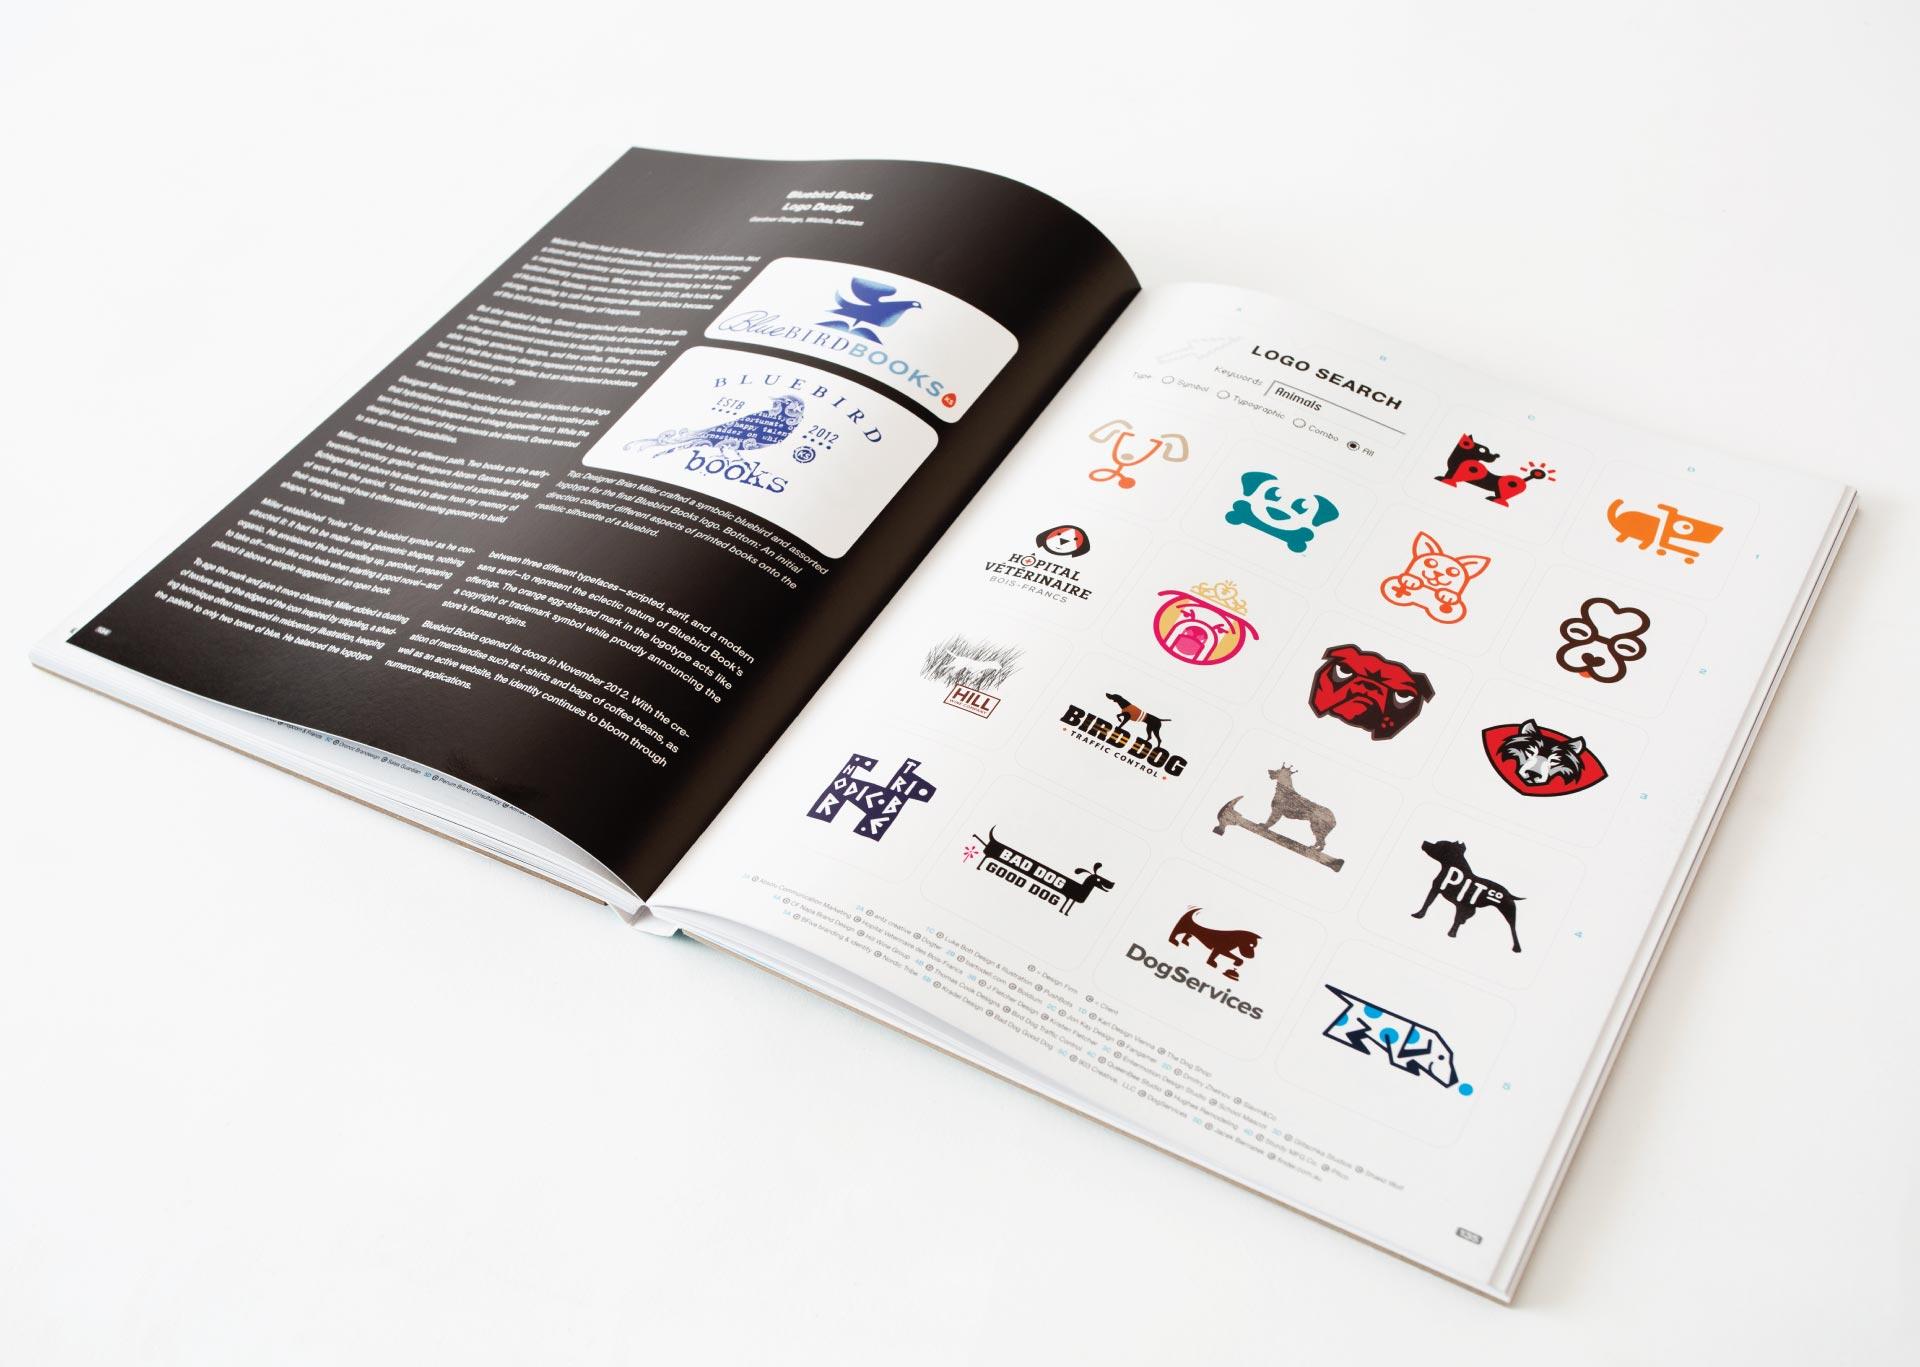 Free photo: Design books.